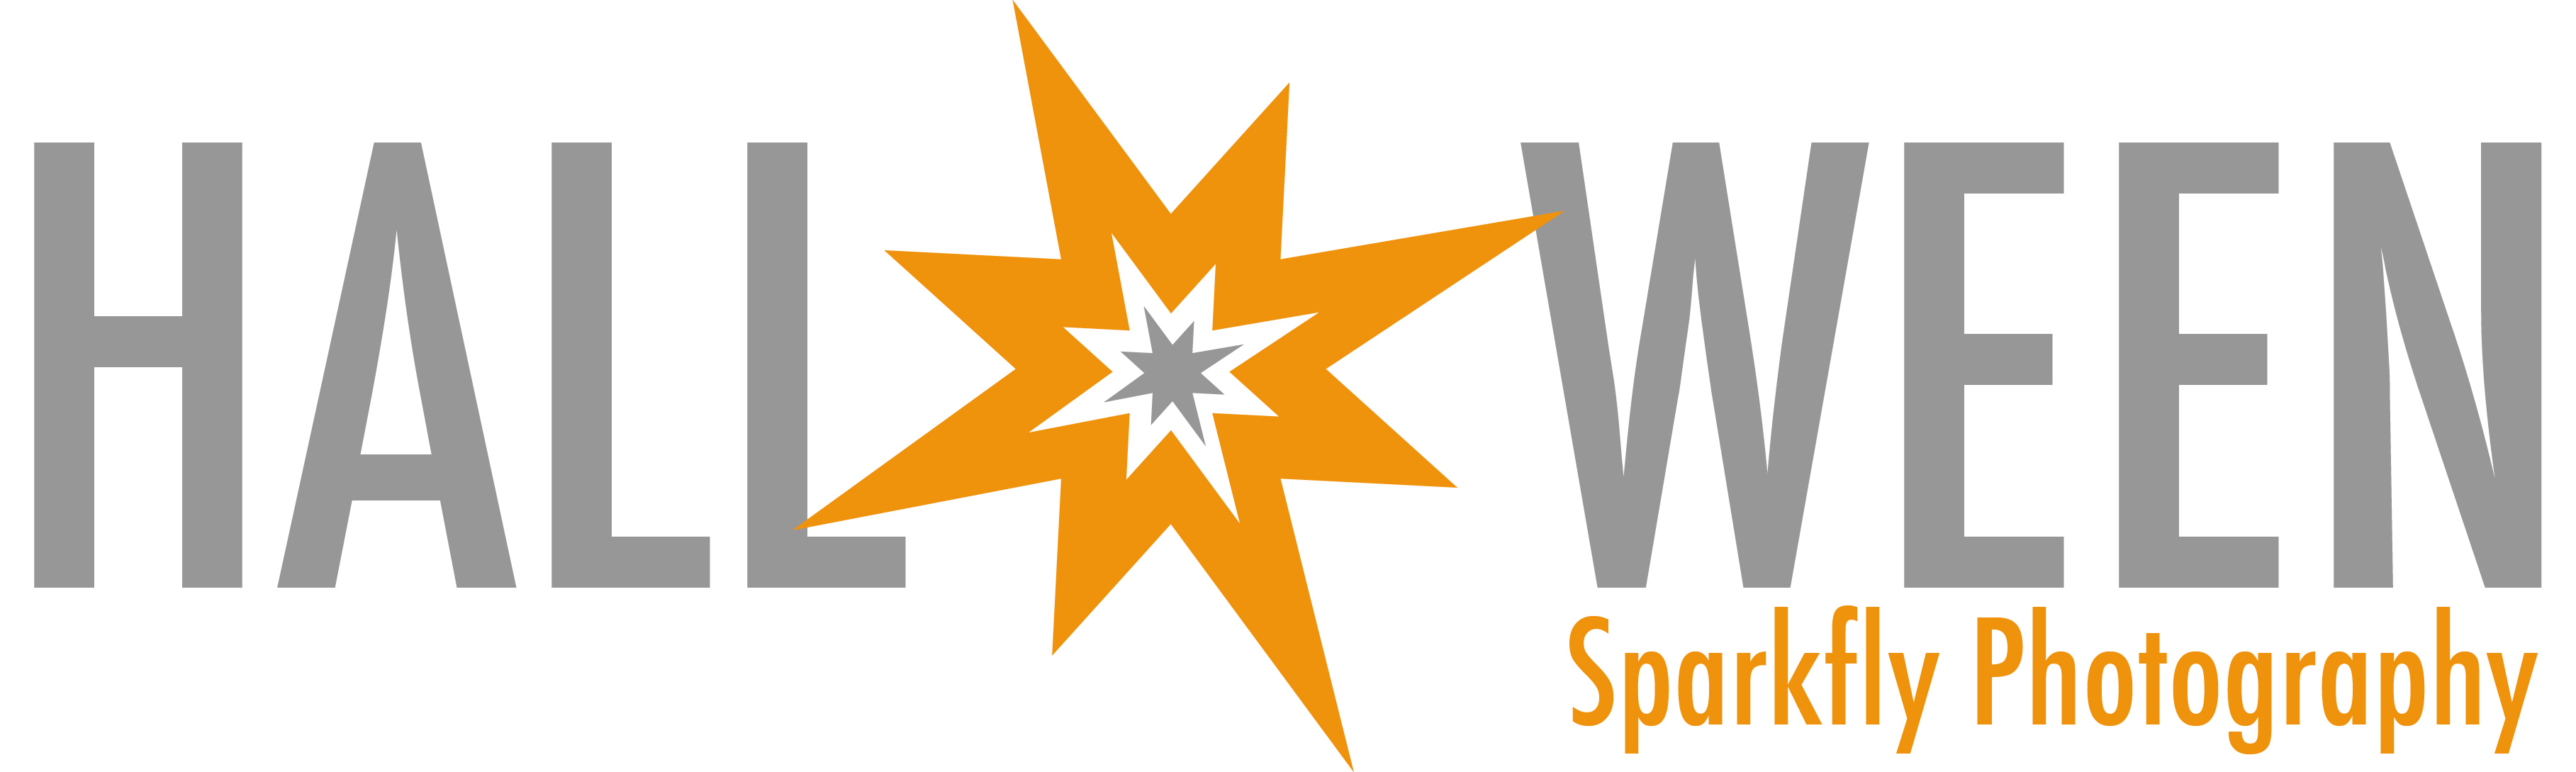 Halloween Logo Sparfkly